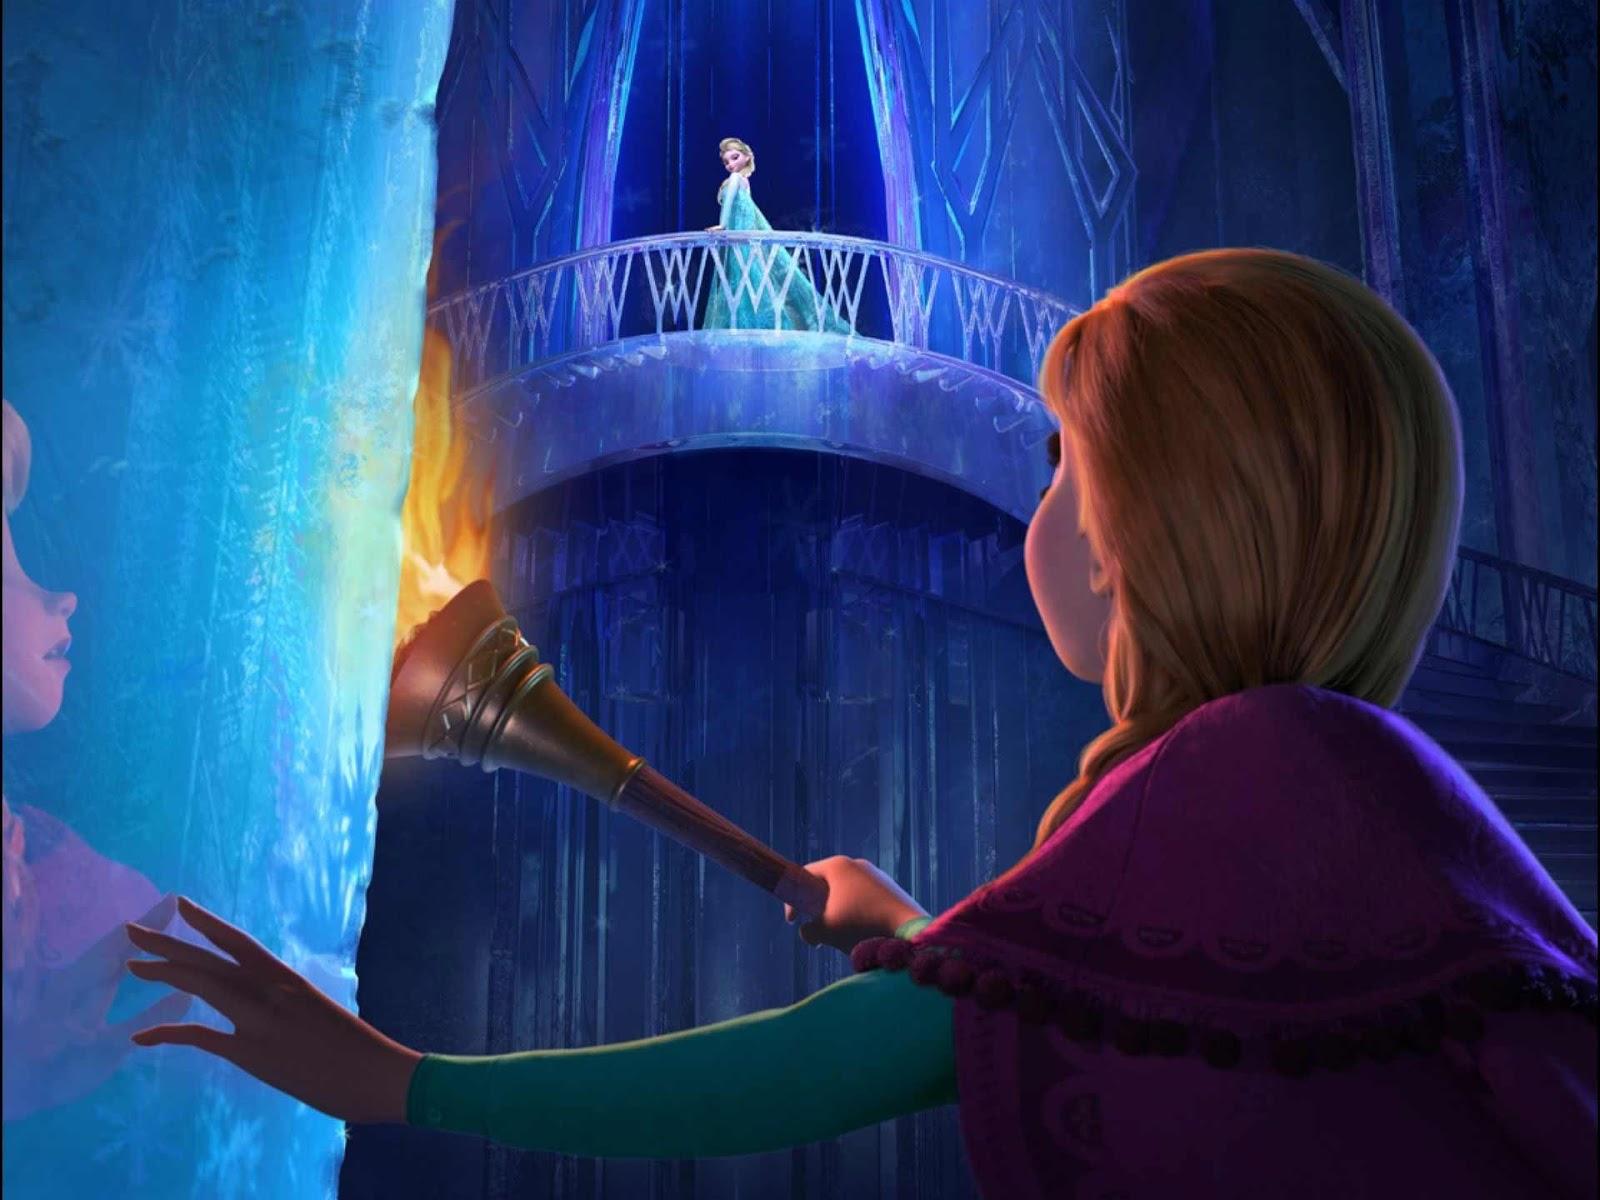 animated 3d movies by walt disney animation studies disney frozen is